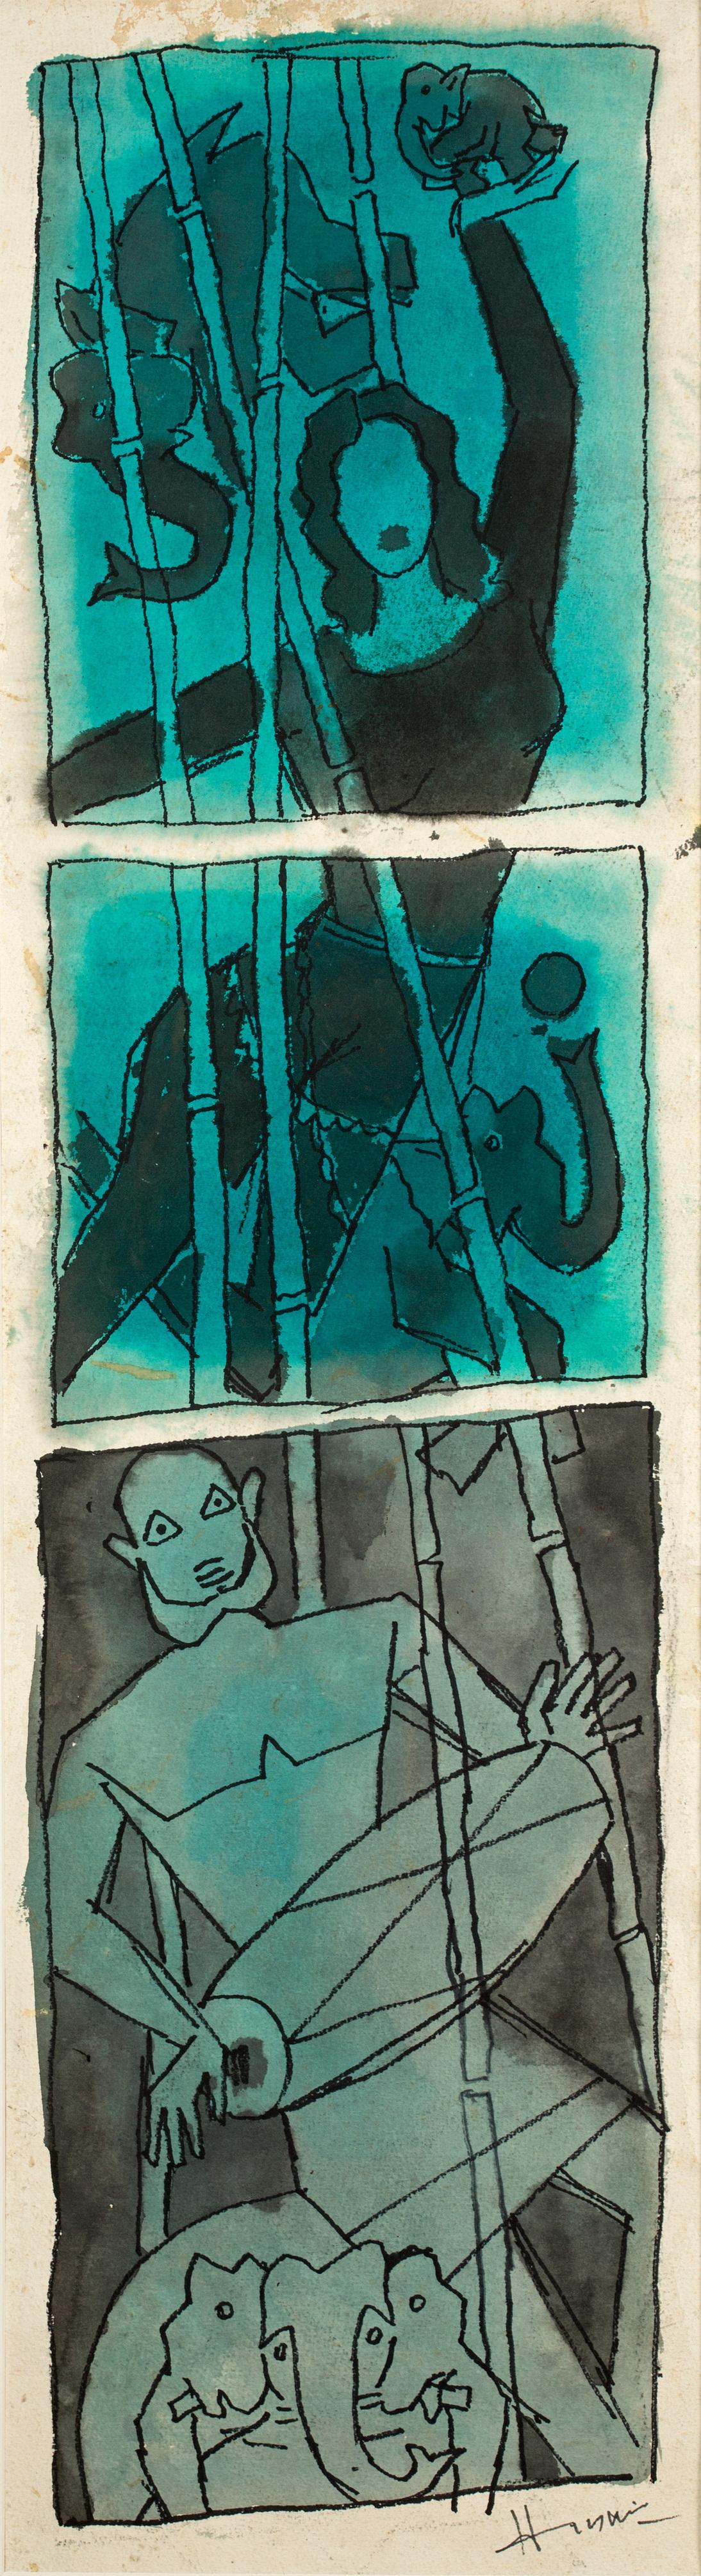 Maqbool Fida Husain-Untitled (Gaja Gamini)-2000